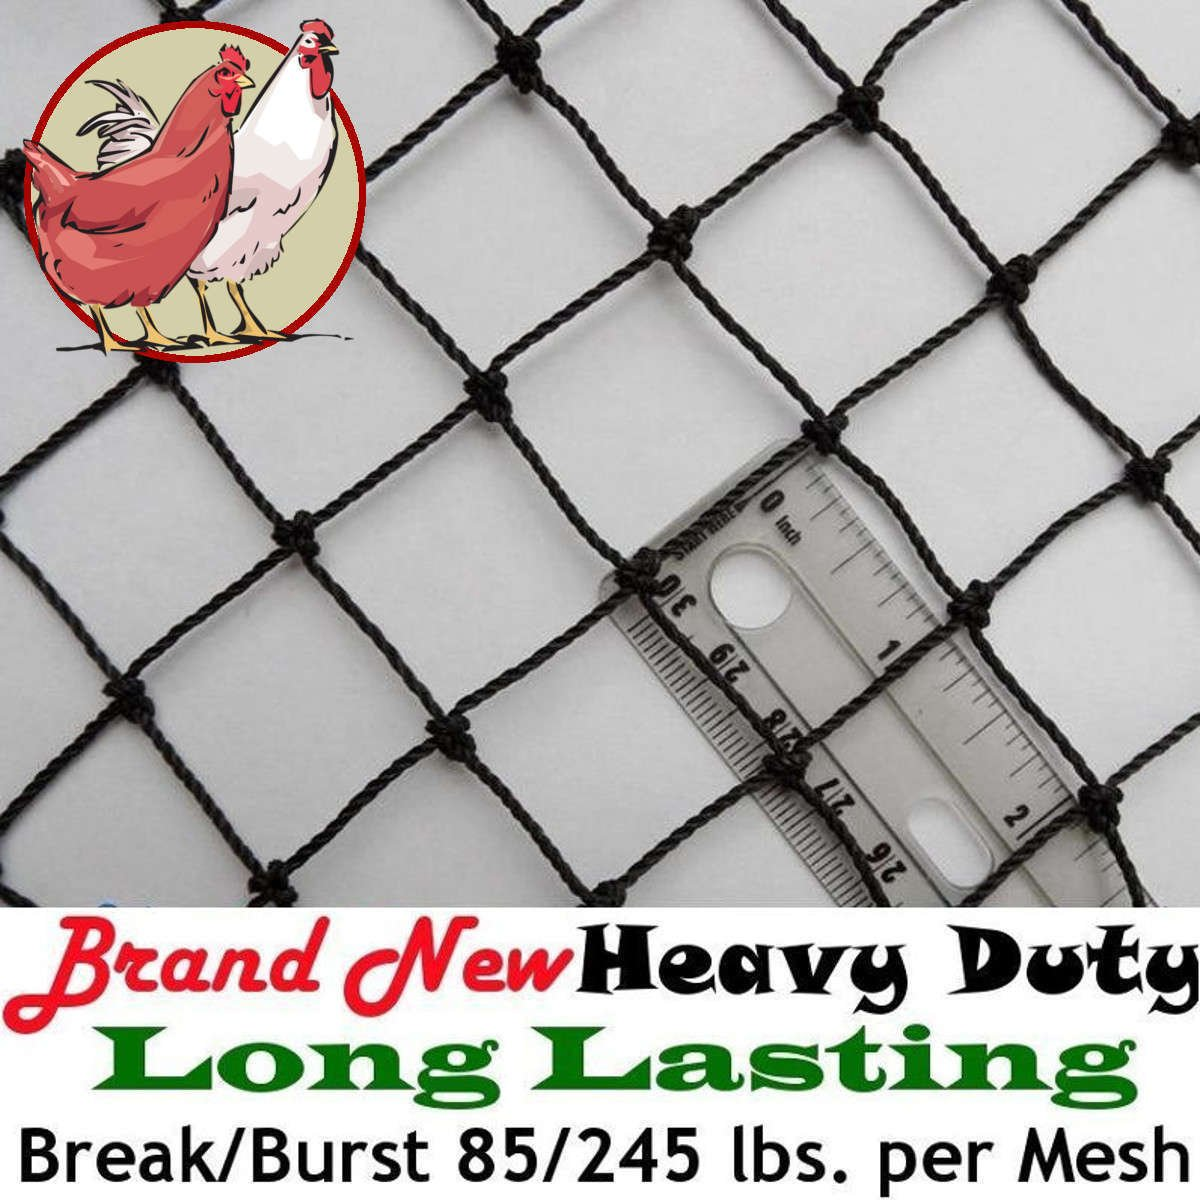 Poultry Netting 25' x 50' Heavy Knotted 1'' Mesh Nets Aviary Gamefowl Quail Chicken Bird Block Net Long Lasting Break/Burst 85/245 lb Polyethylene 8-10 Year Lifespan 33lb Ship Weight